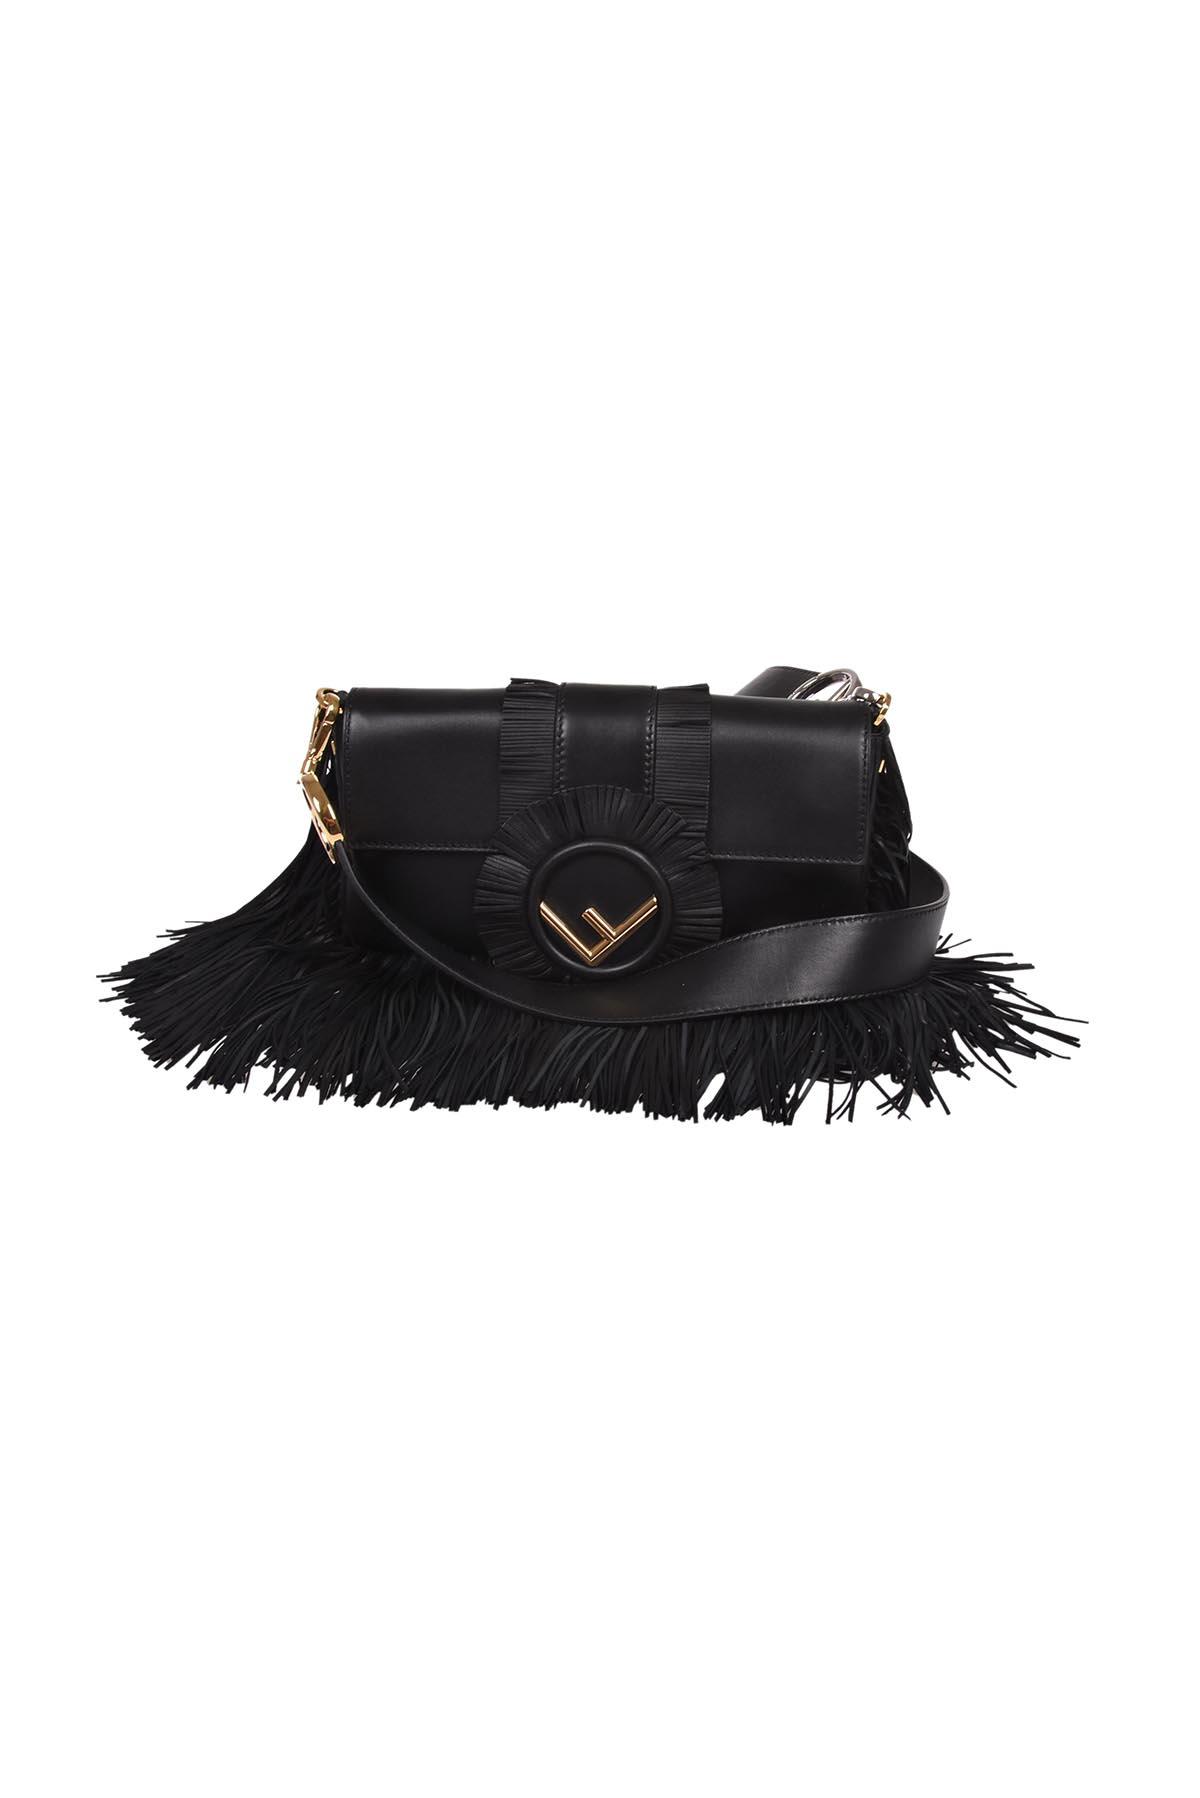 Fendi Baguette Fringed Bag